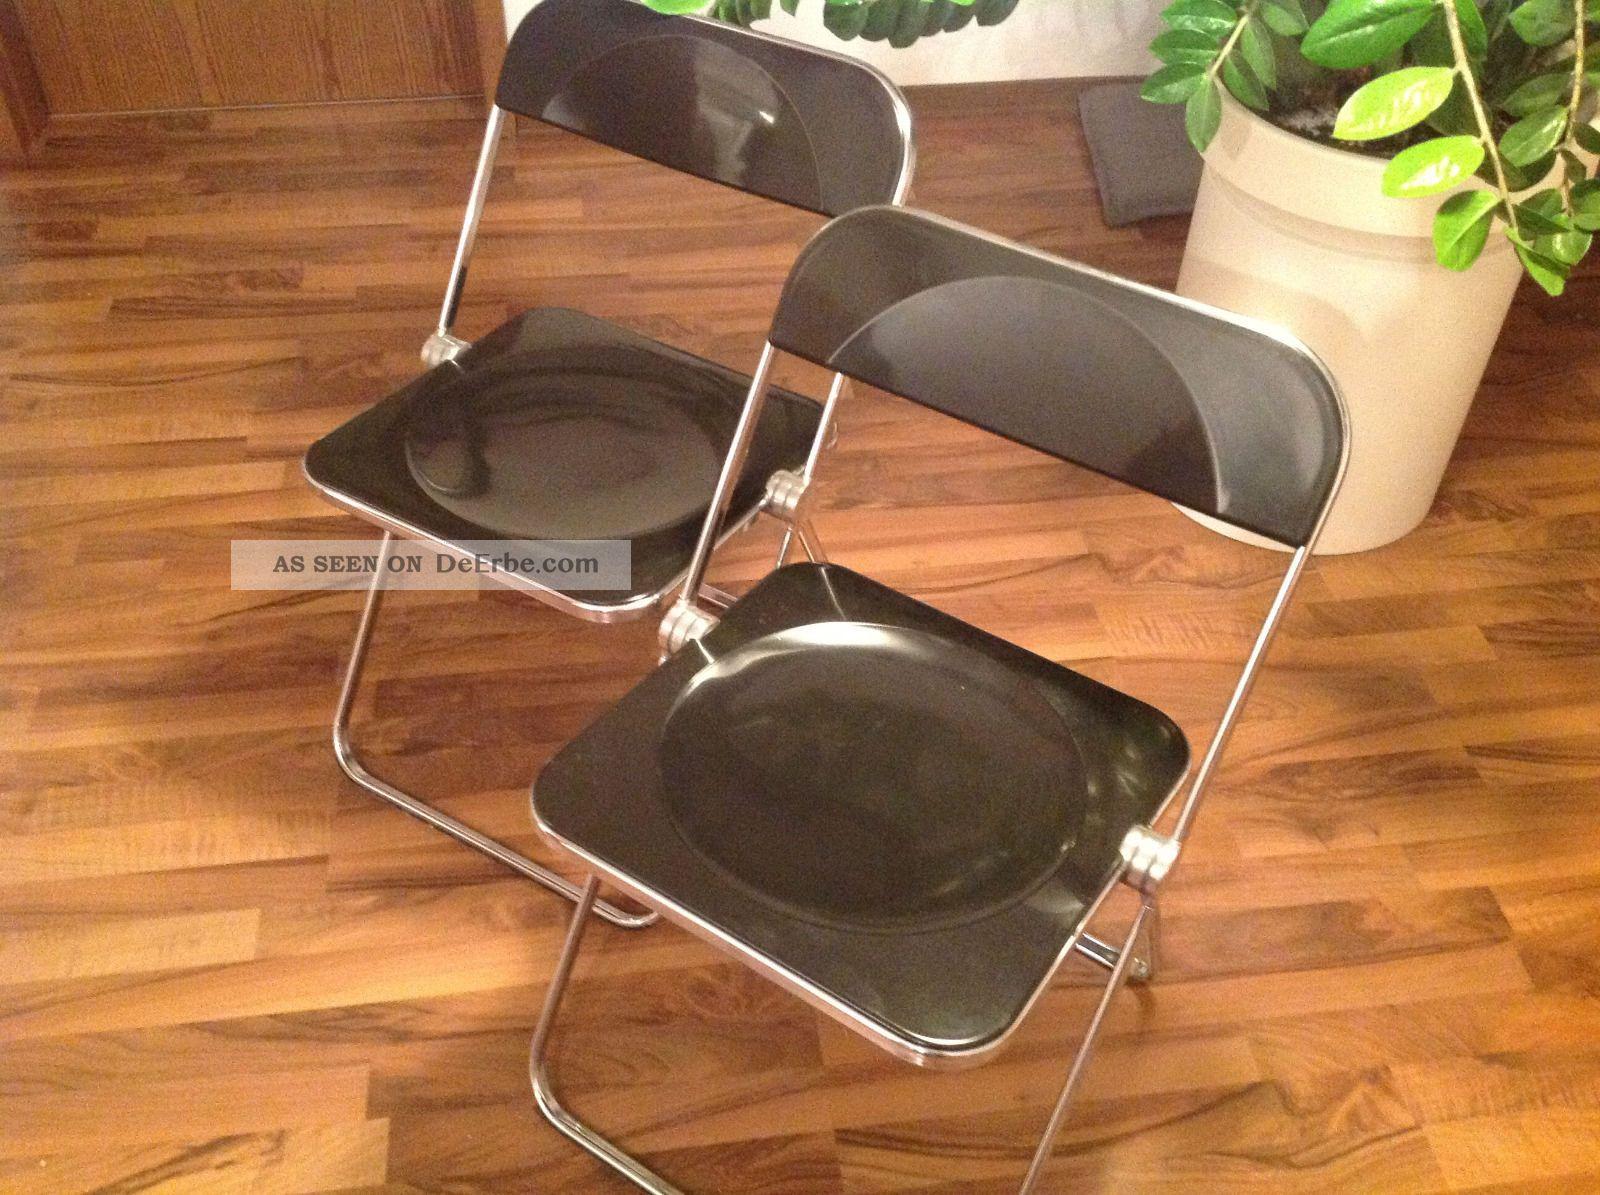 Castelli Plia Klappstuhl.2x Design Klappstuhl Castelli Plia Stuhl Designerstuhl